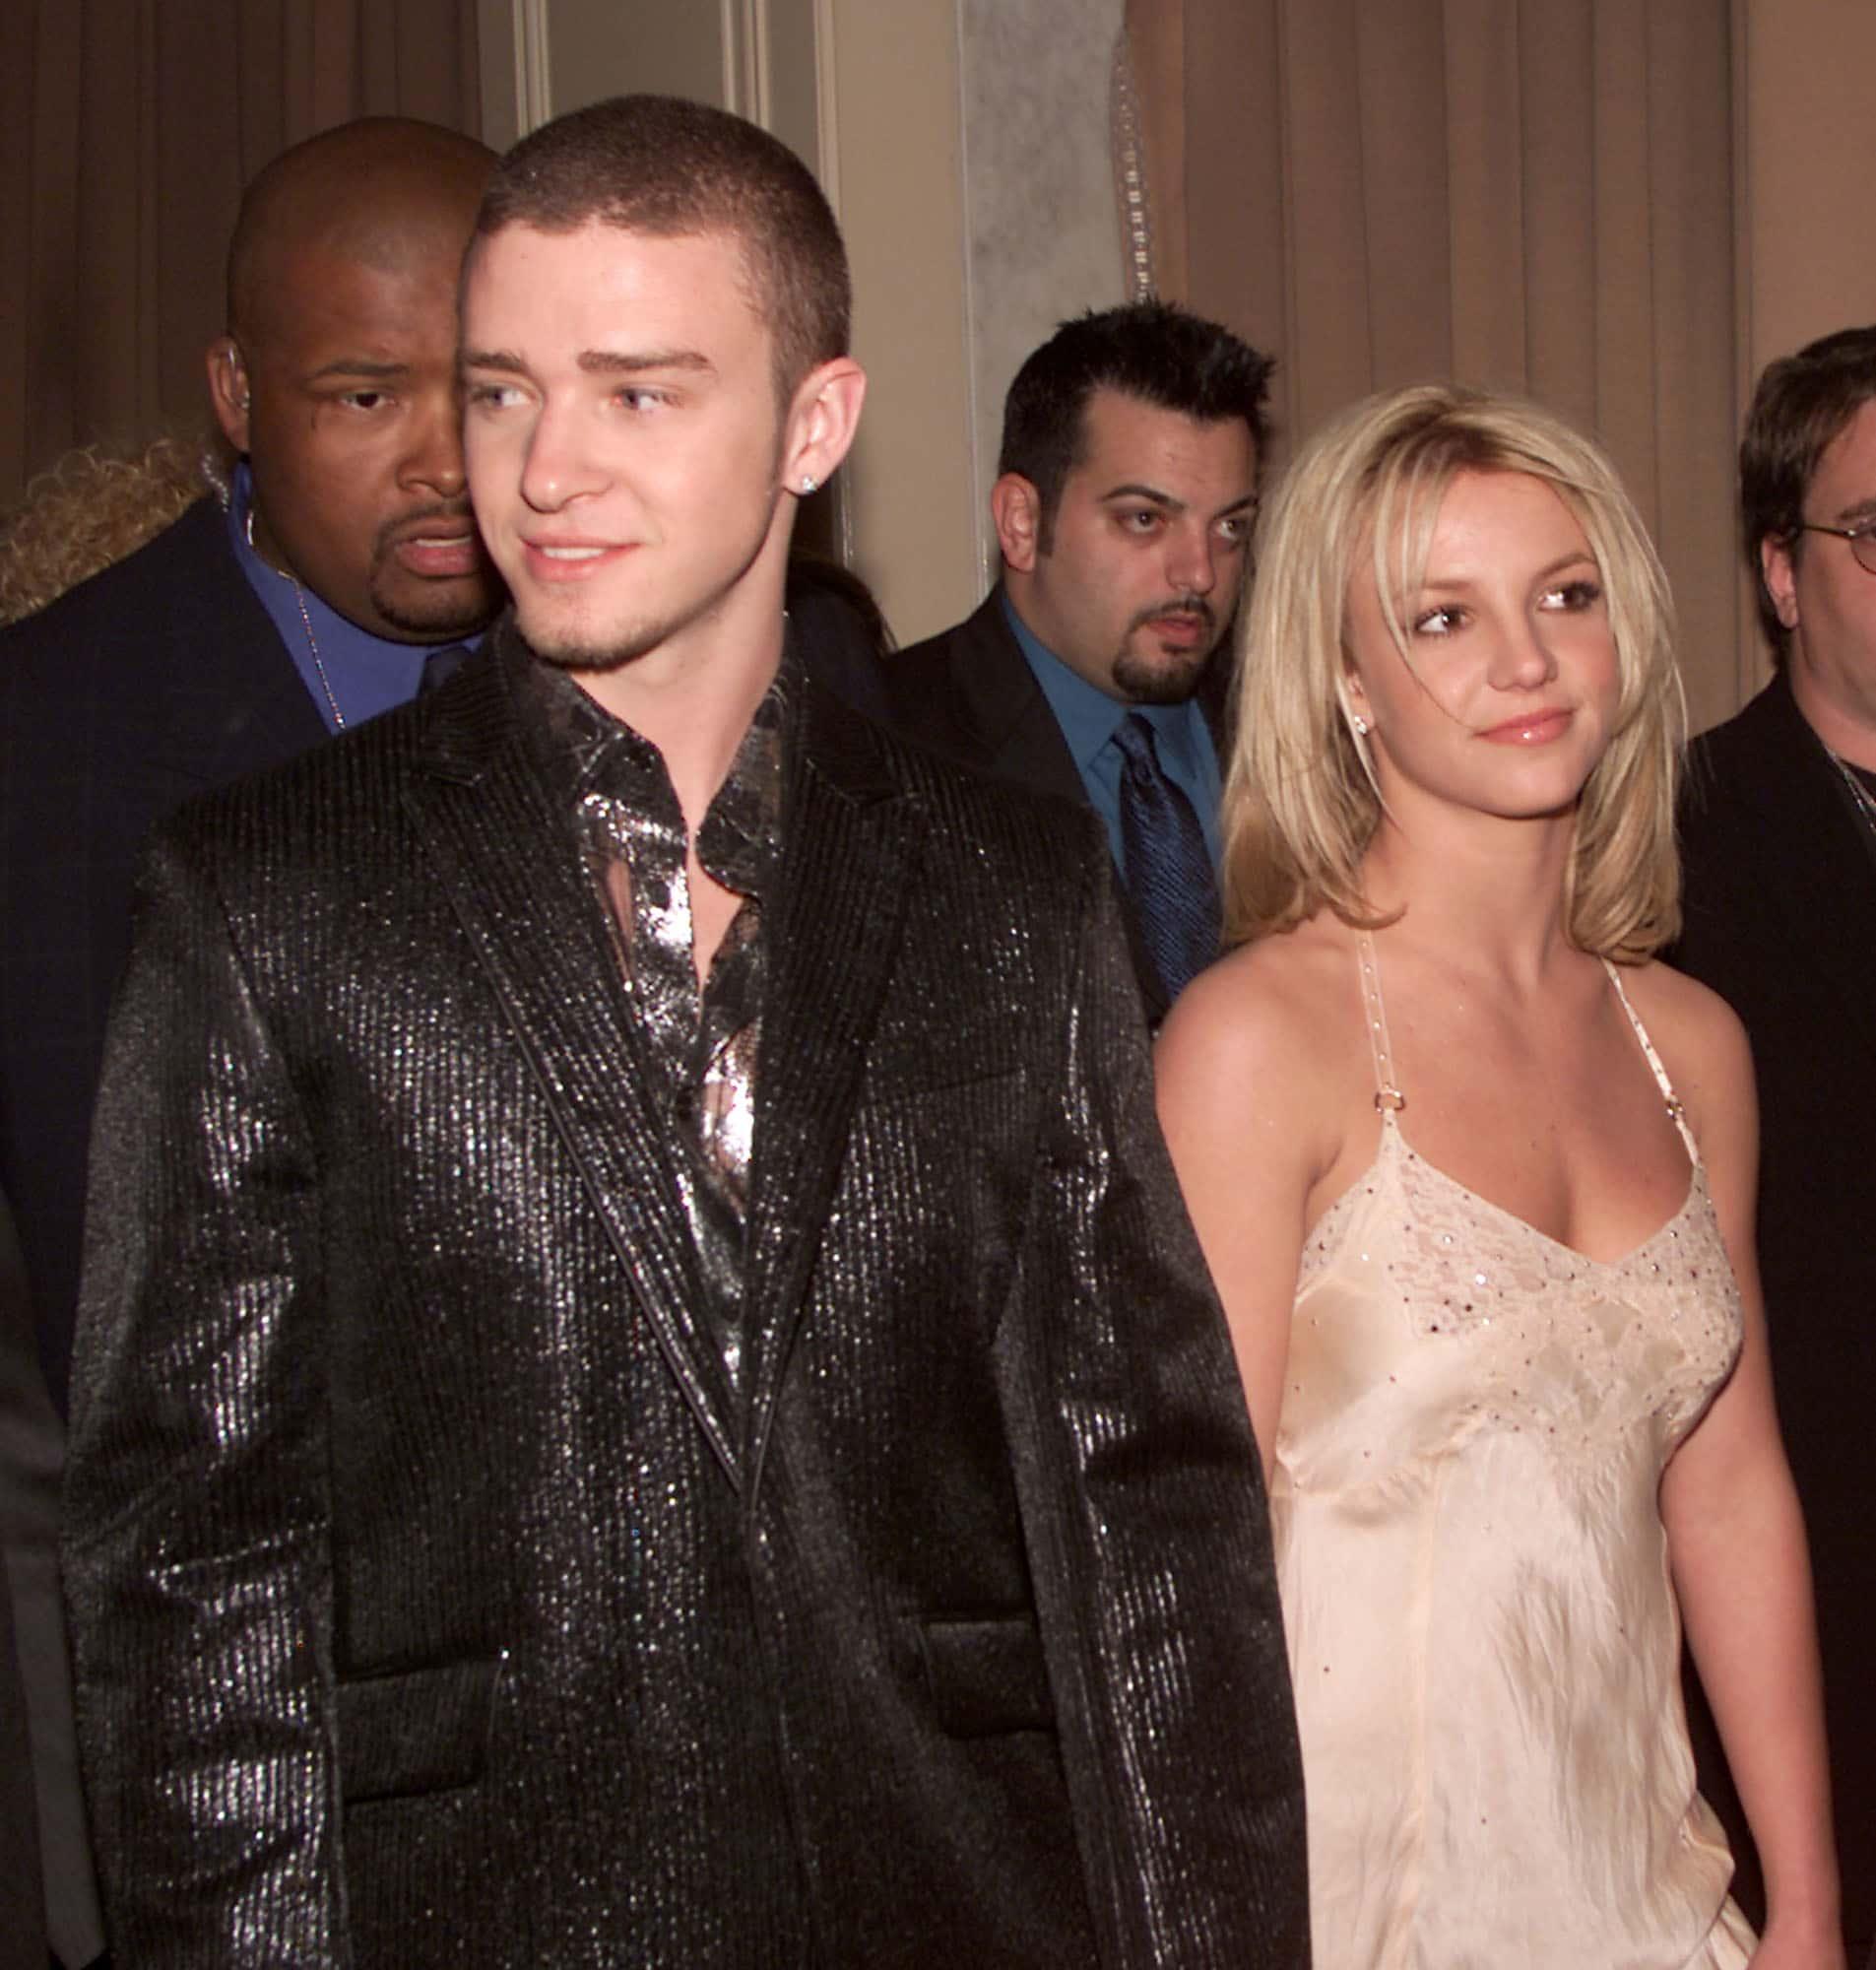 Britney Spears Calls Justin Timberlake a Genius, Says